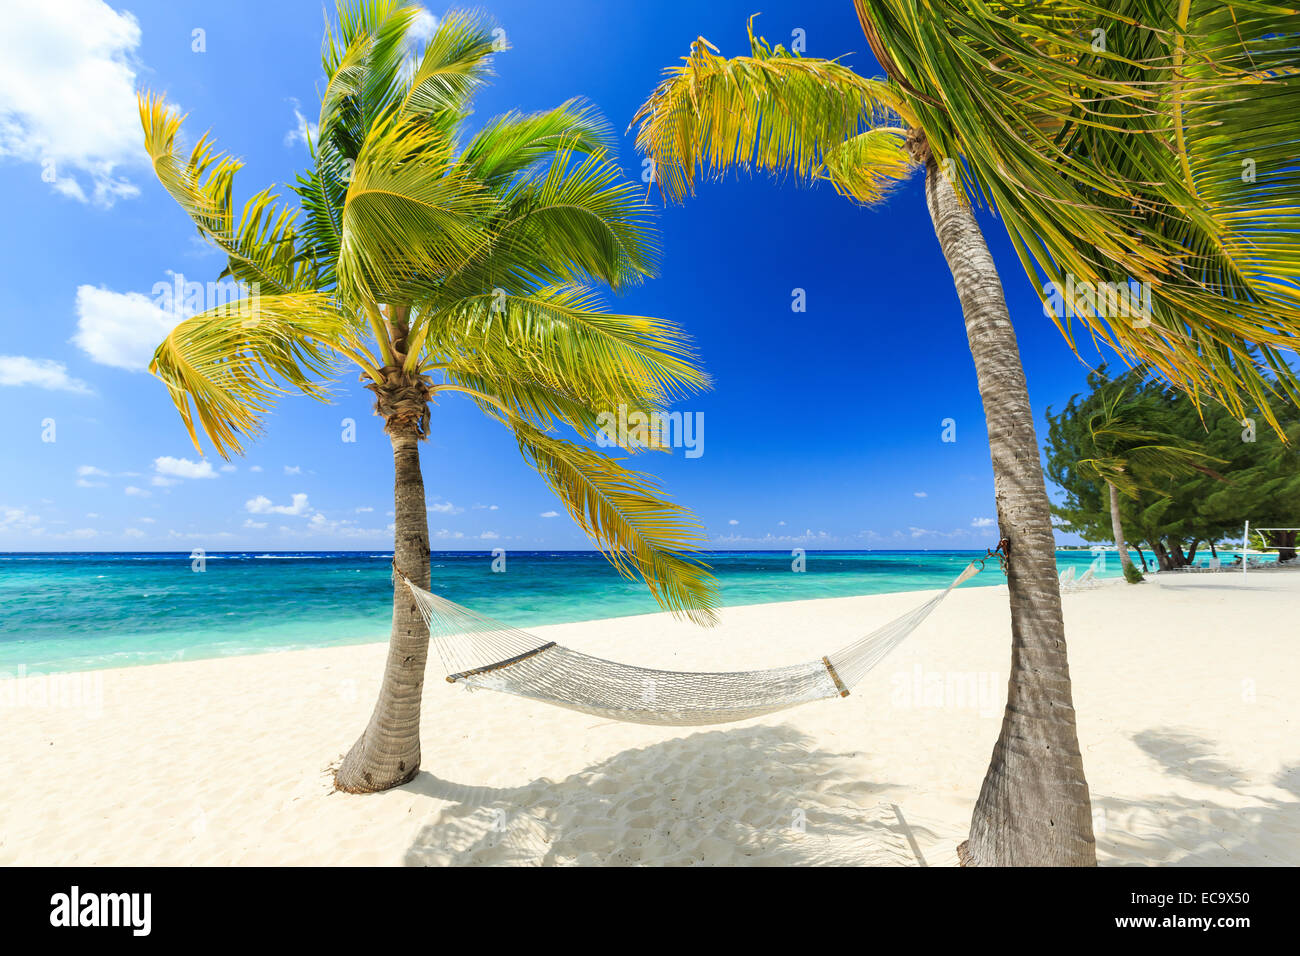 Grand Cayman, Cayman Islands - Stock Image